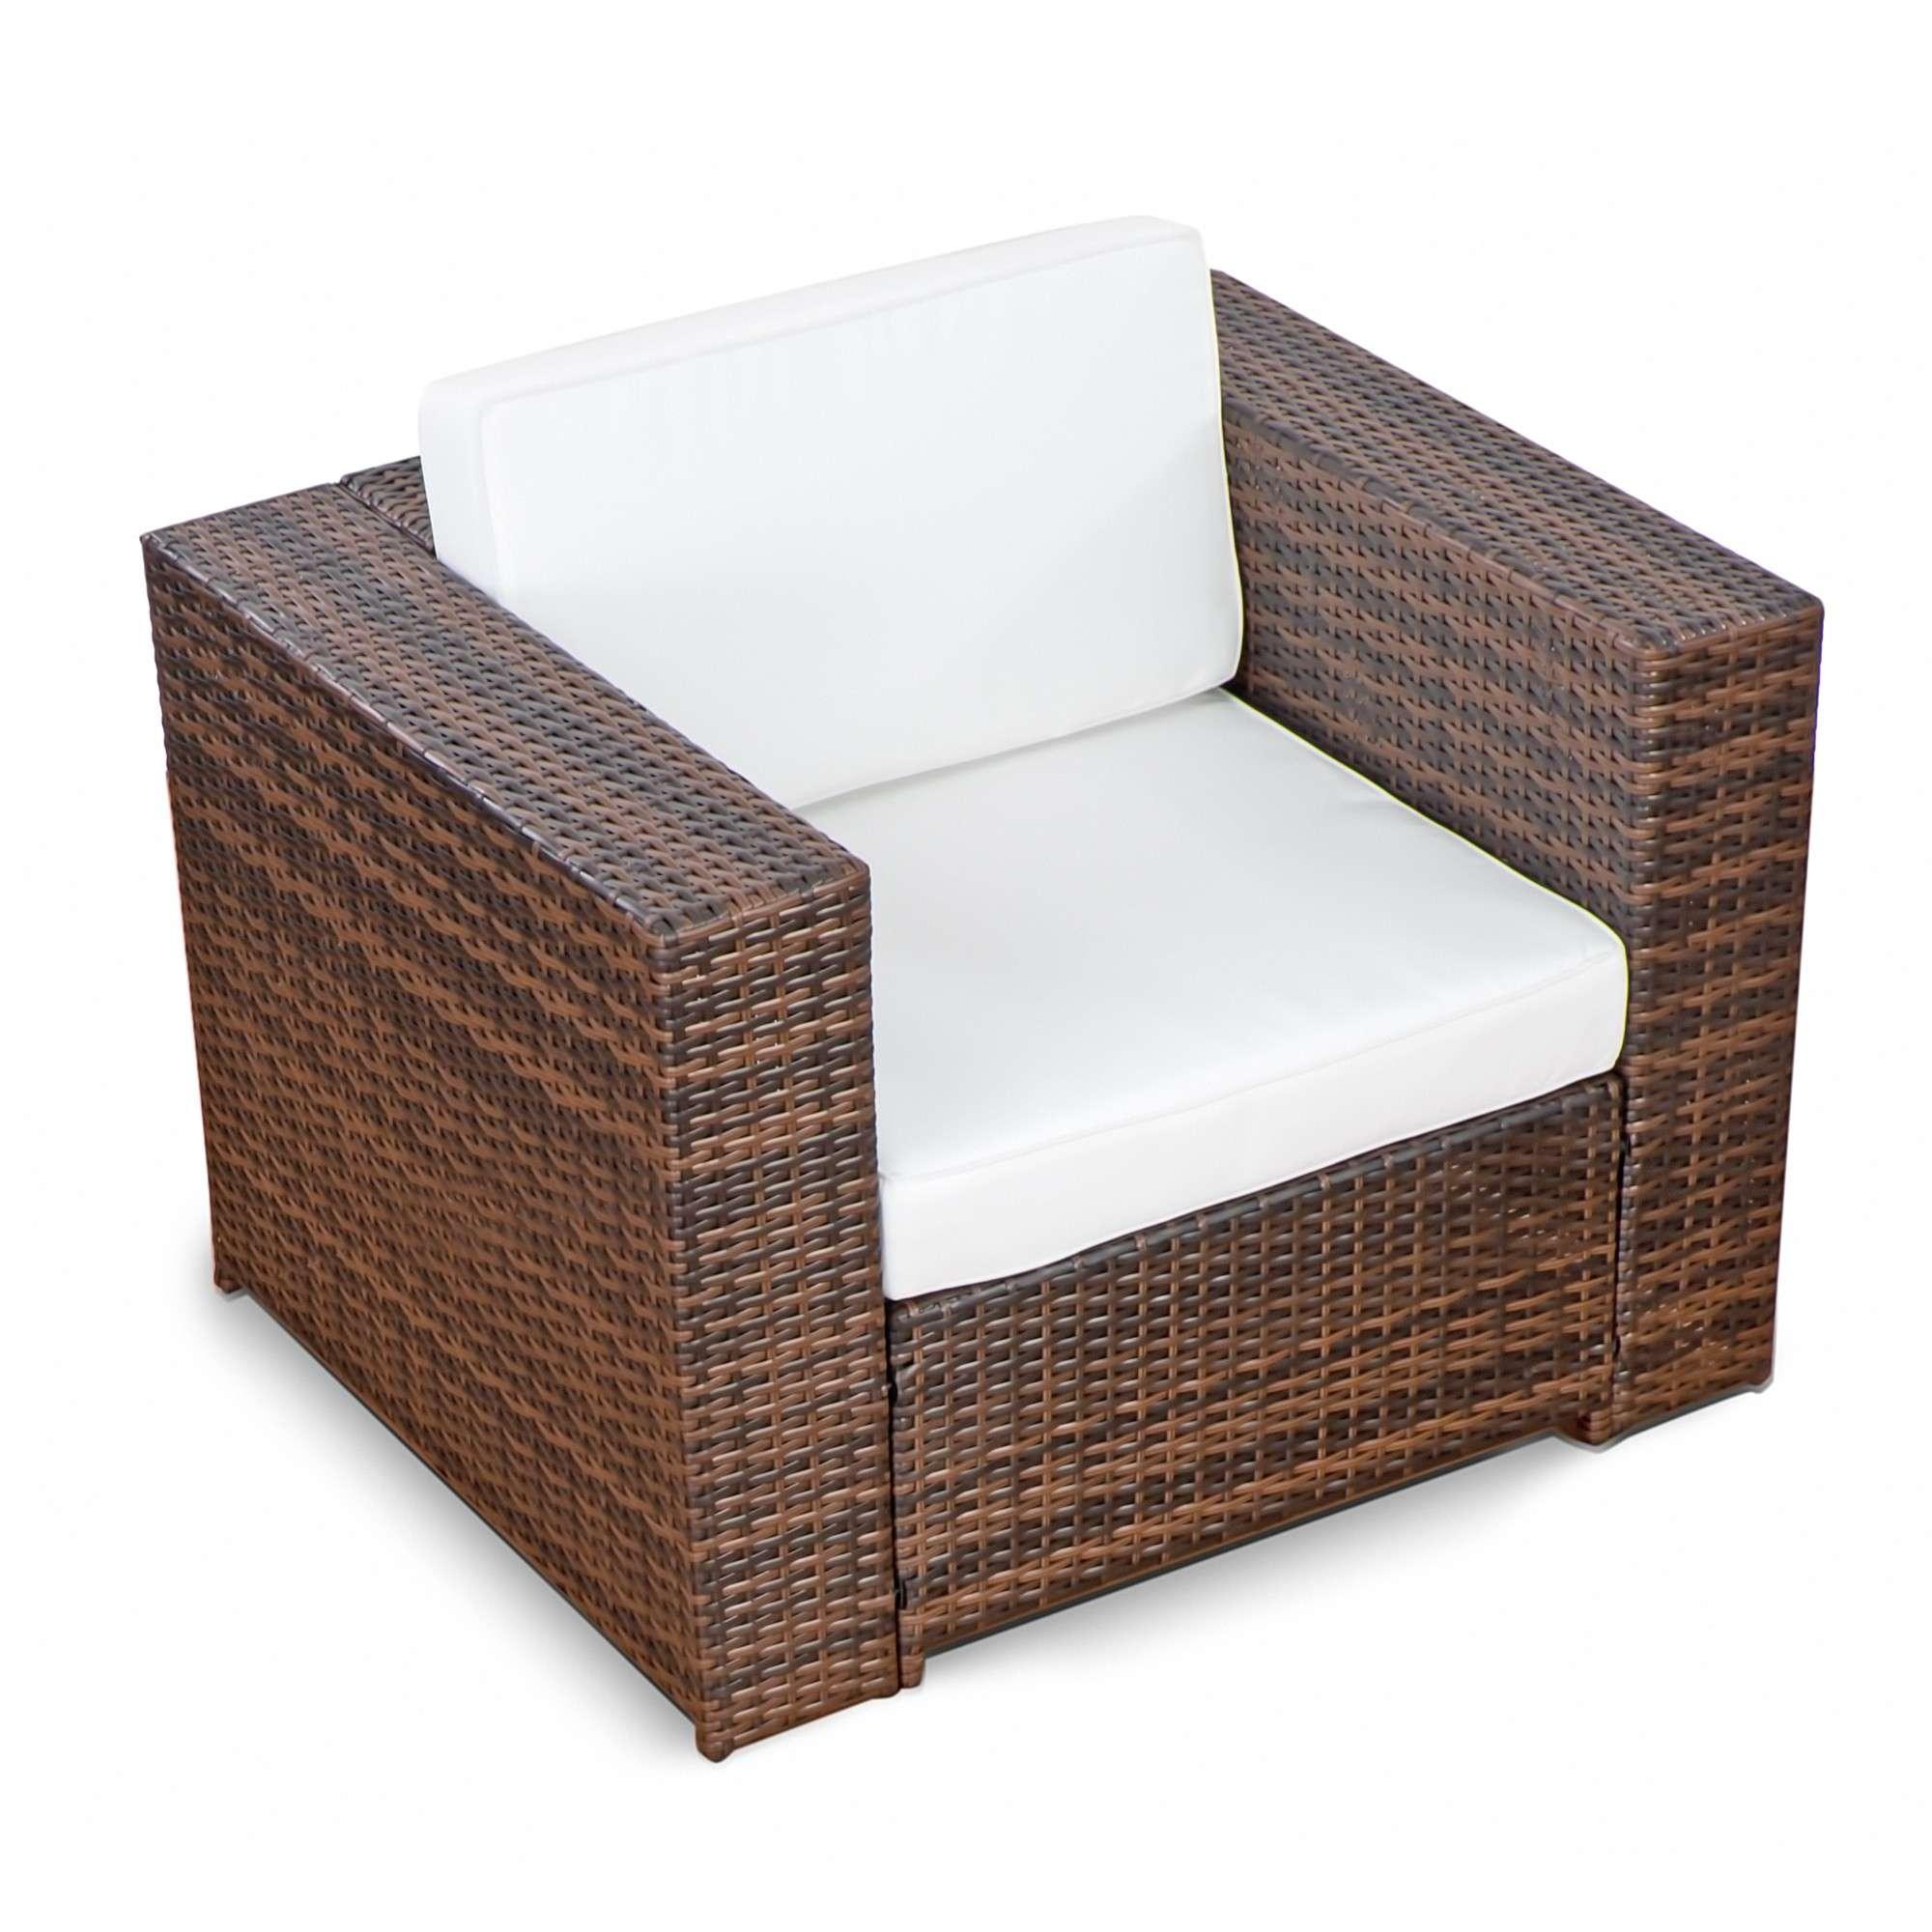 Lounge sessel braun  Loungesessel ▻ günstig ◅ Lounge Sessel kaufen